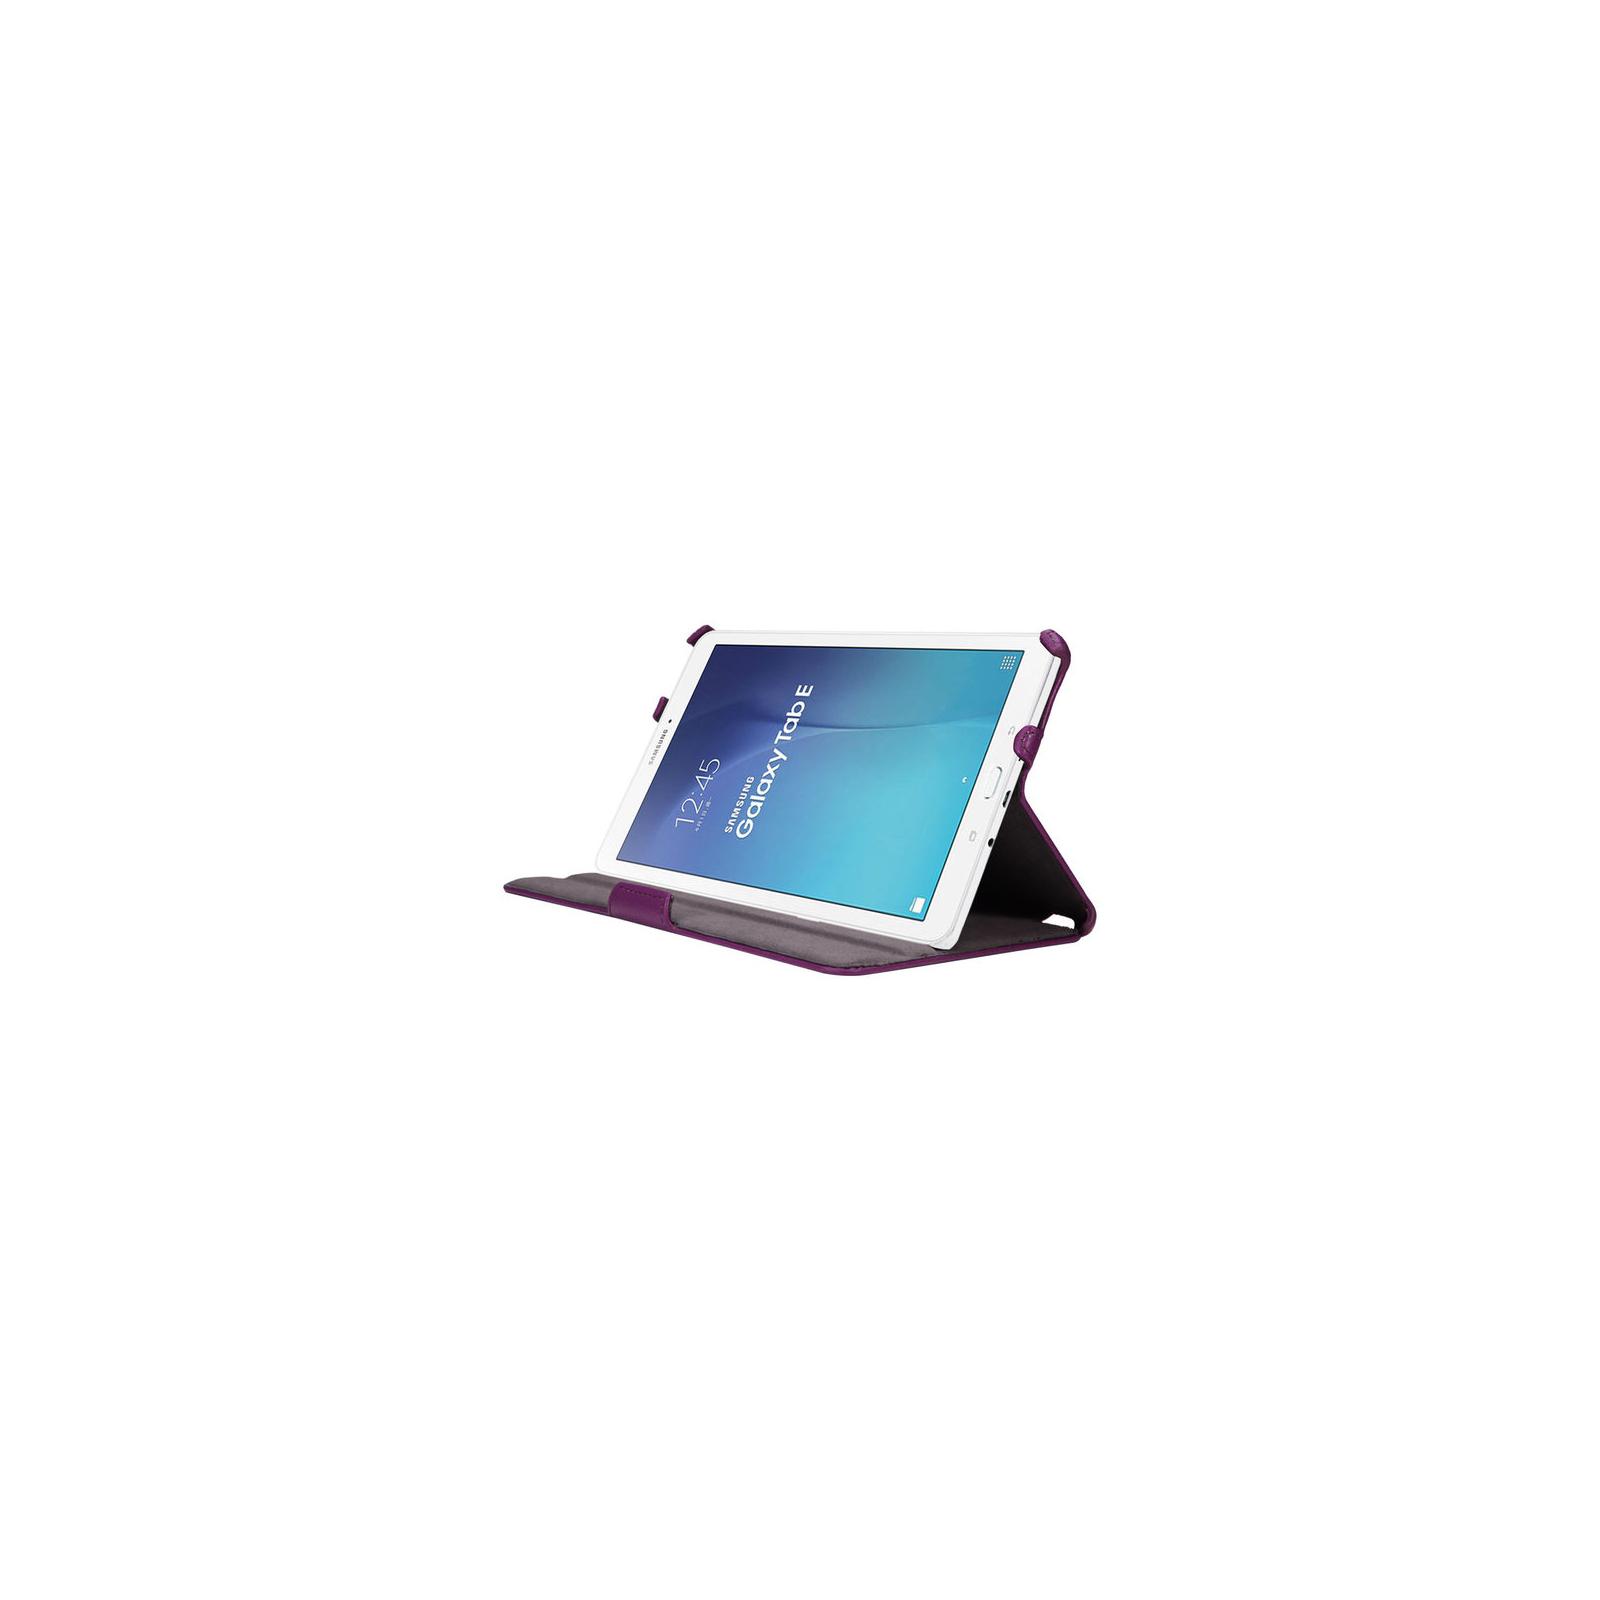 Чехол для планшета AirOn для Samsung Galaxy Tab E 9.6 vio (4822352776329) изображение 5